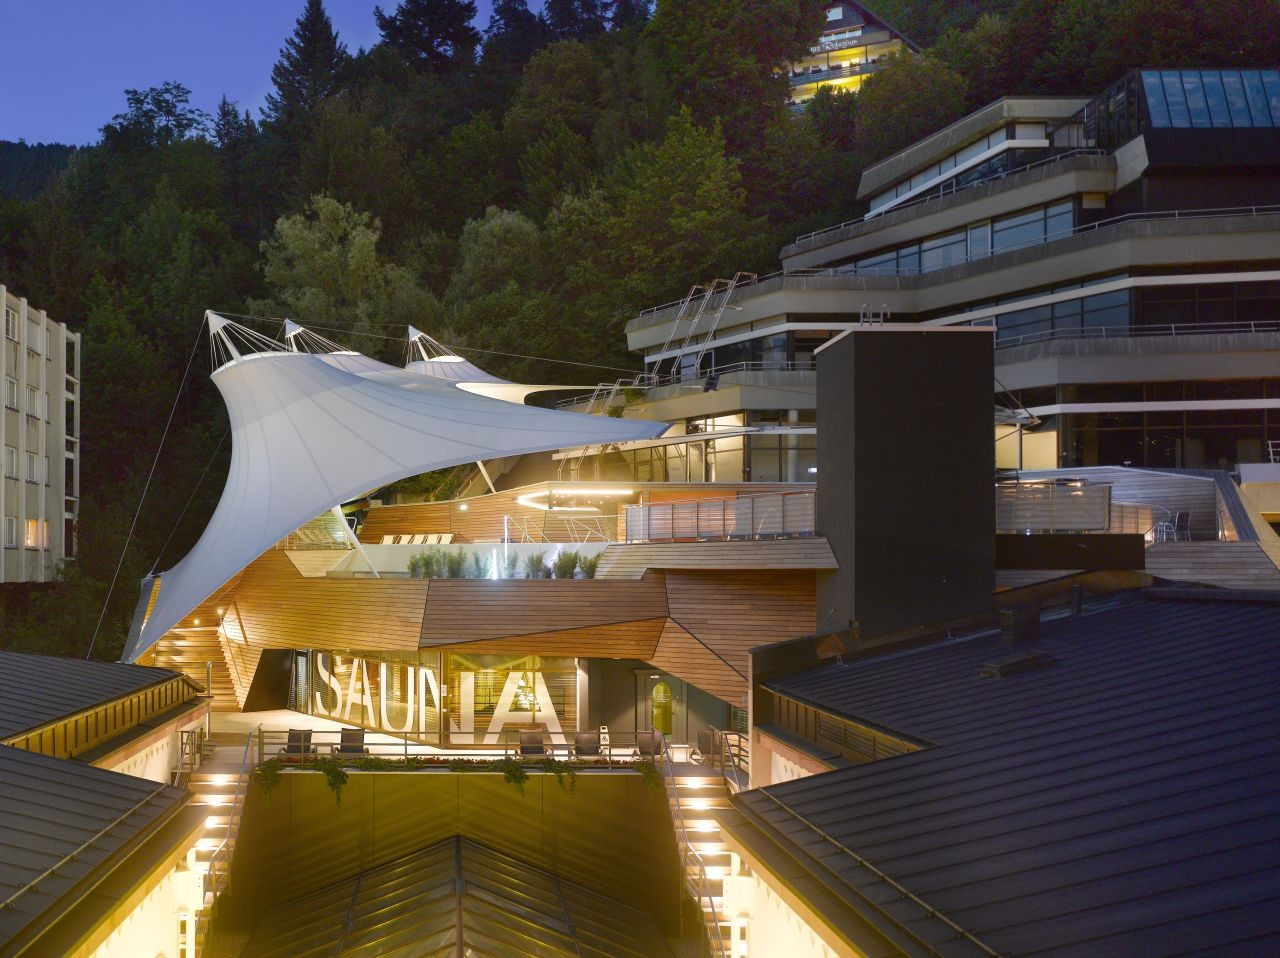 Palais Thermal / KTP Architecten + formTL, © Roland Halbe